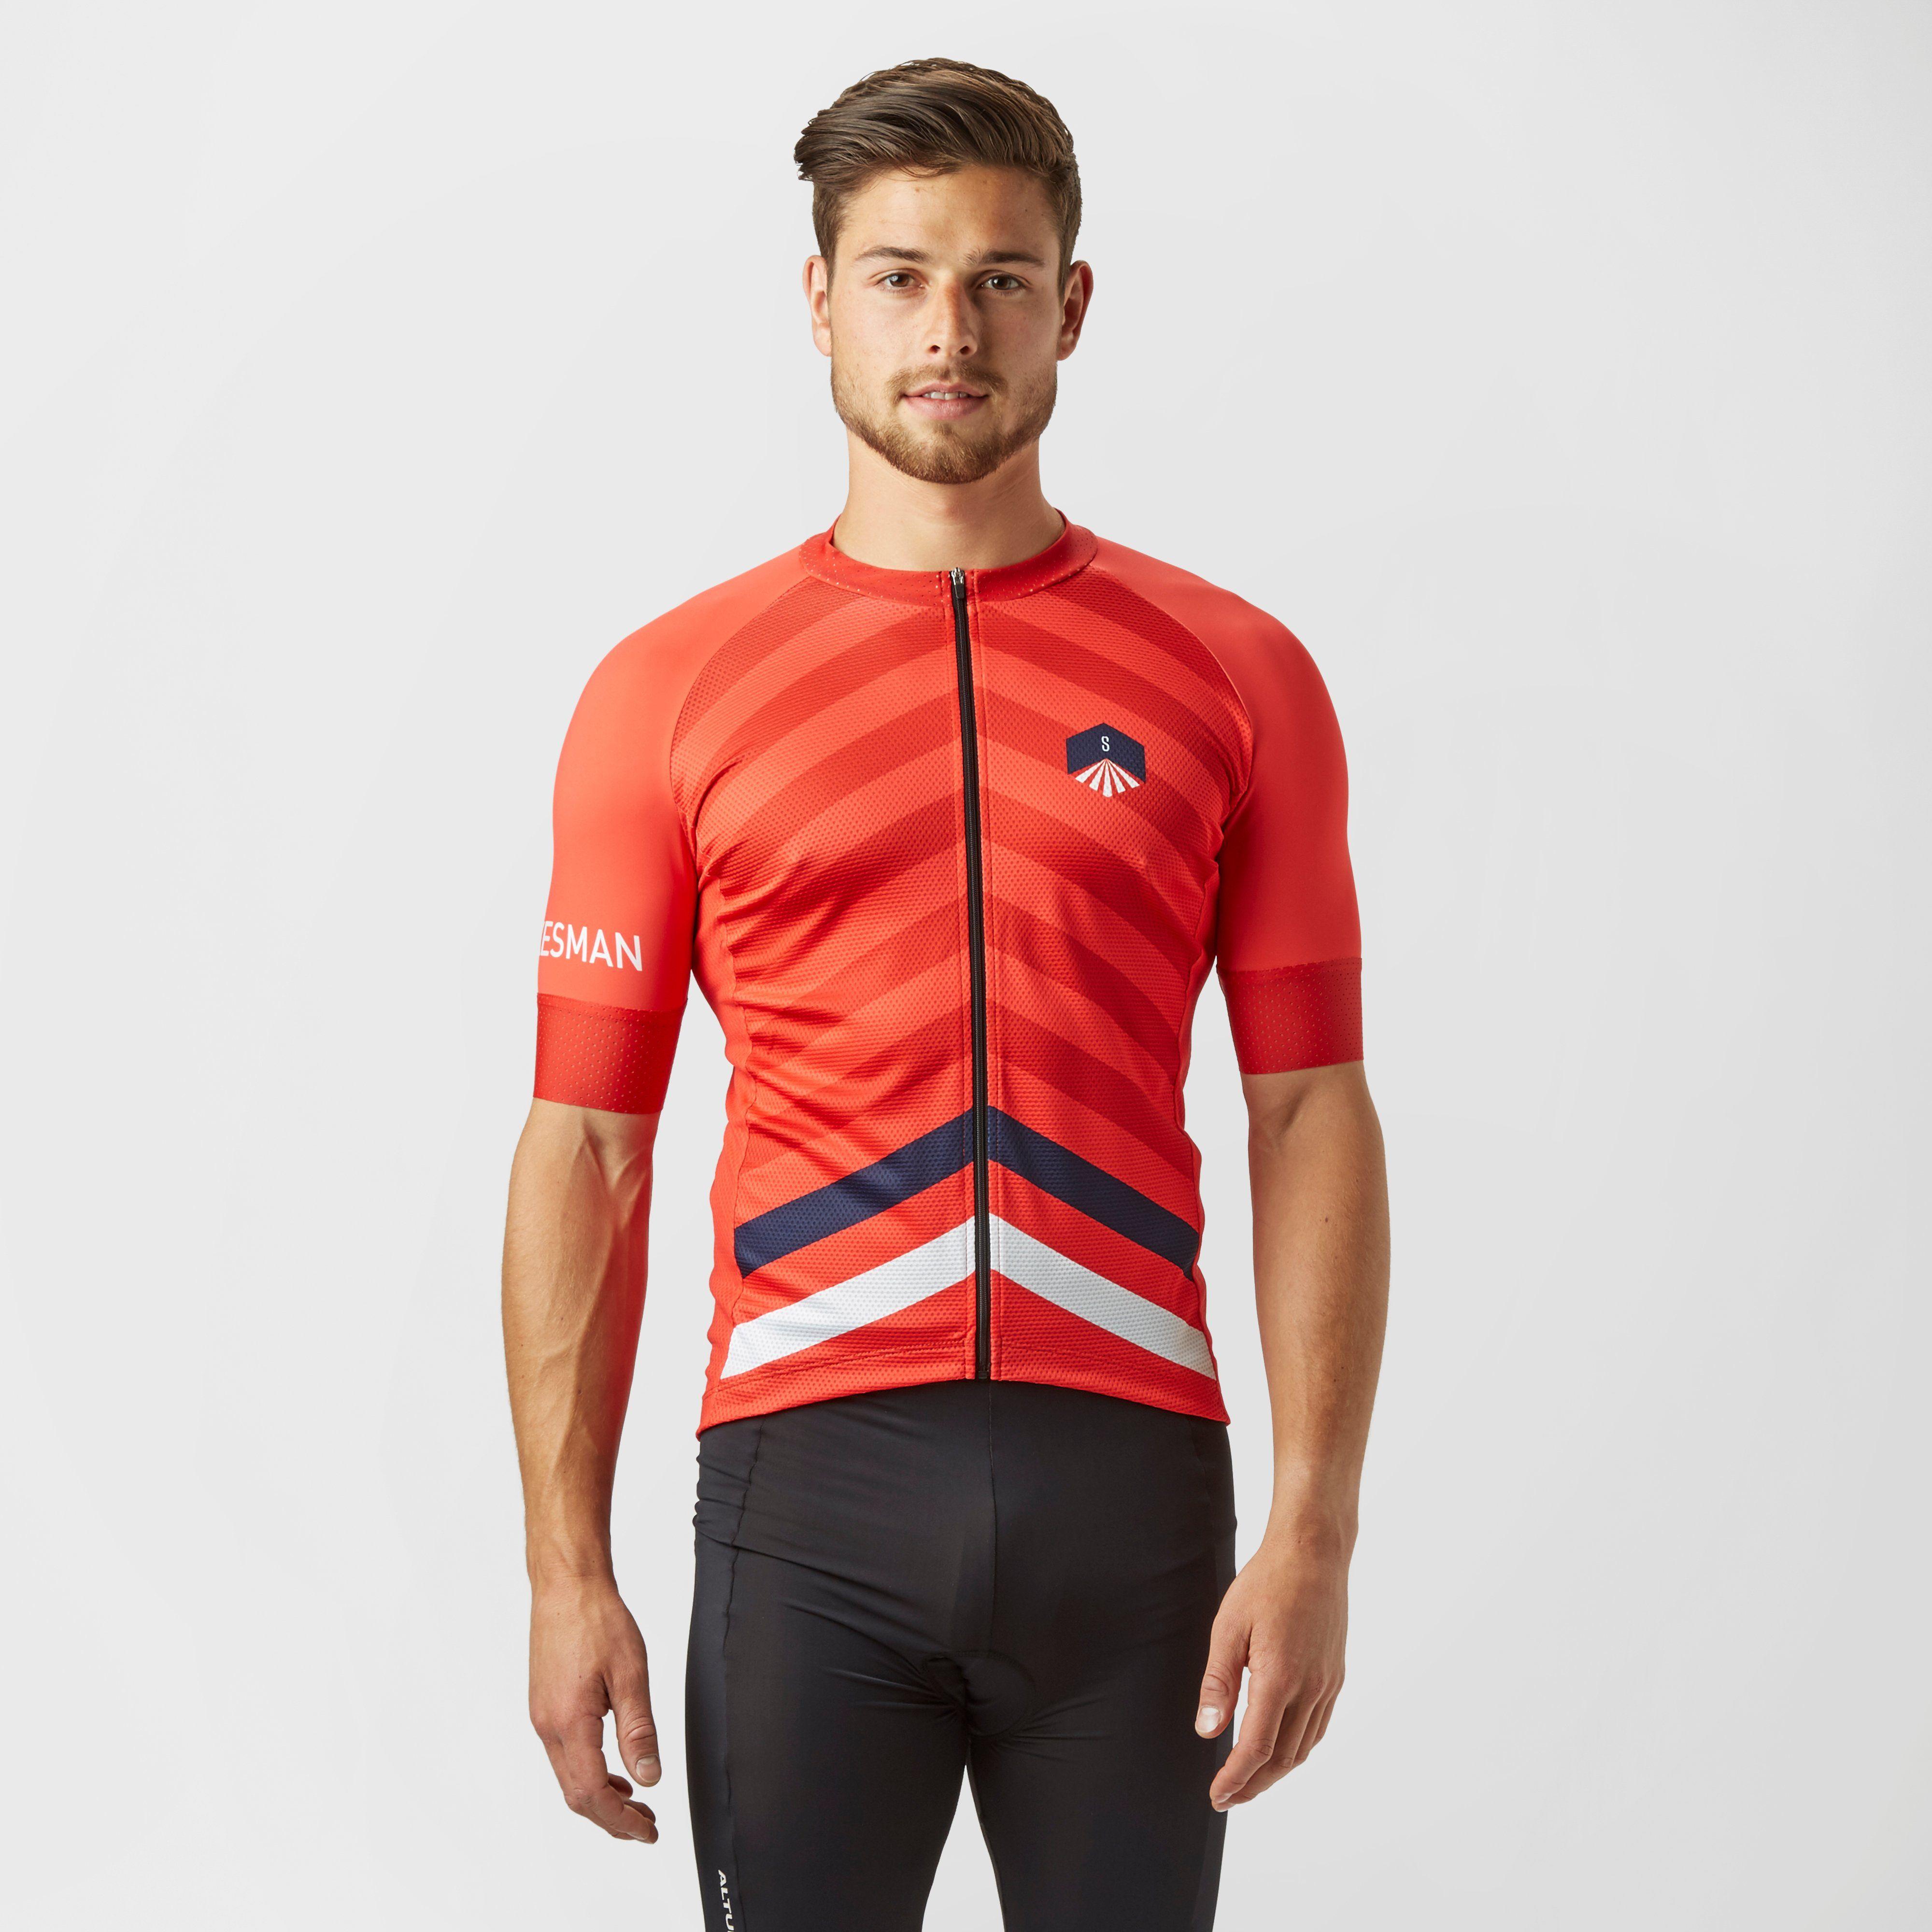 SPOKESMAN Men's Attack Cycling Jersey